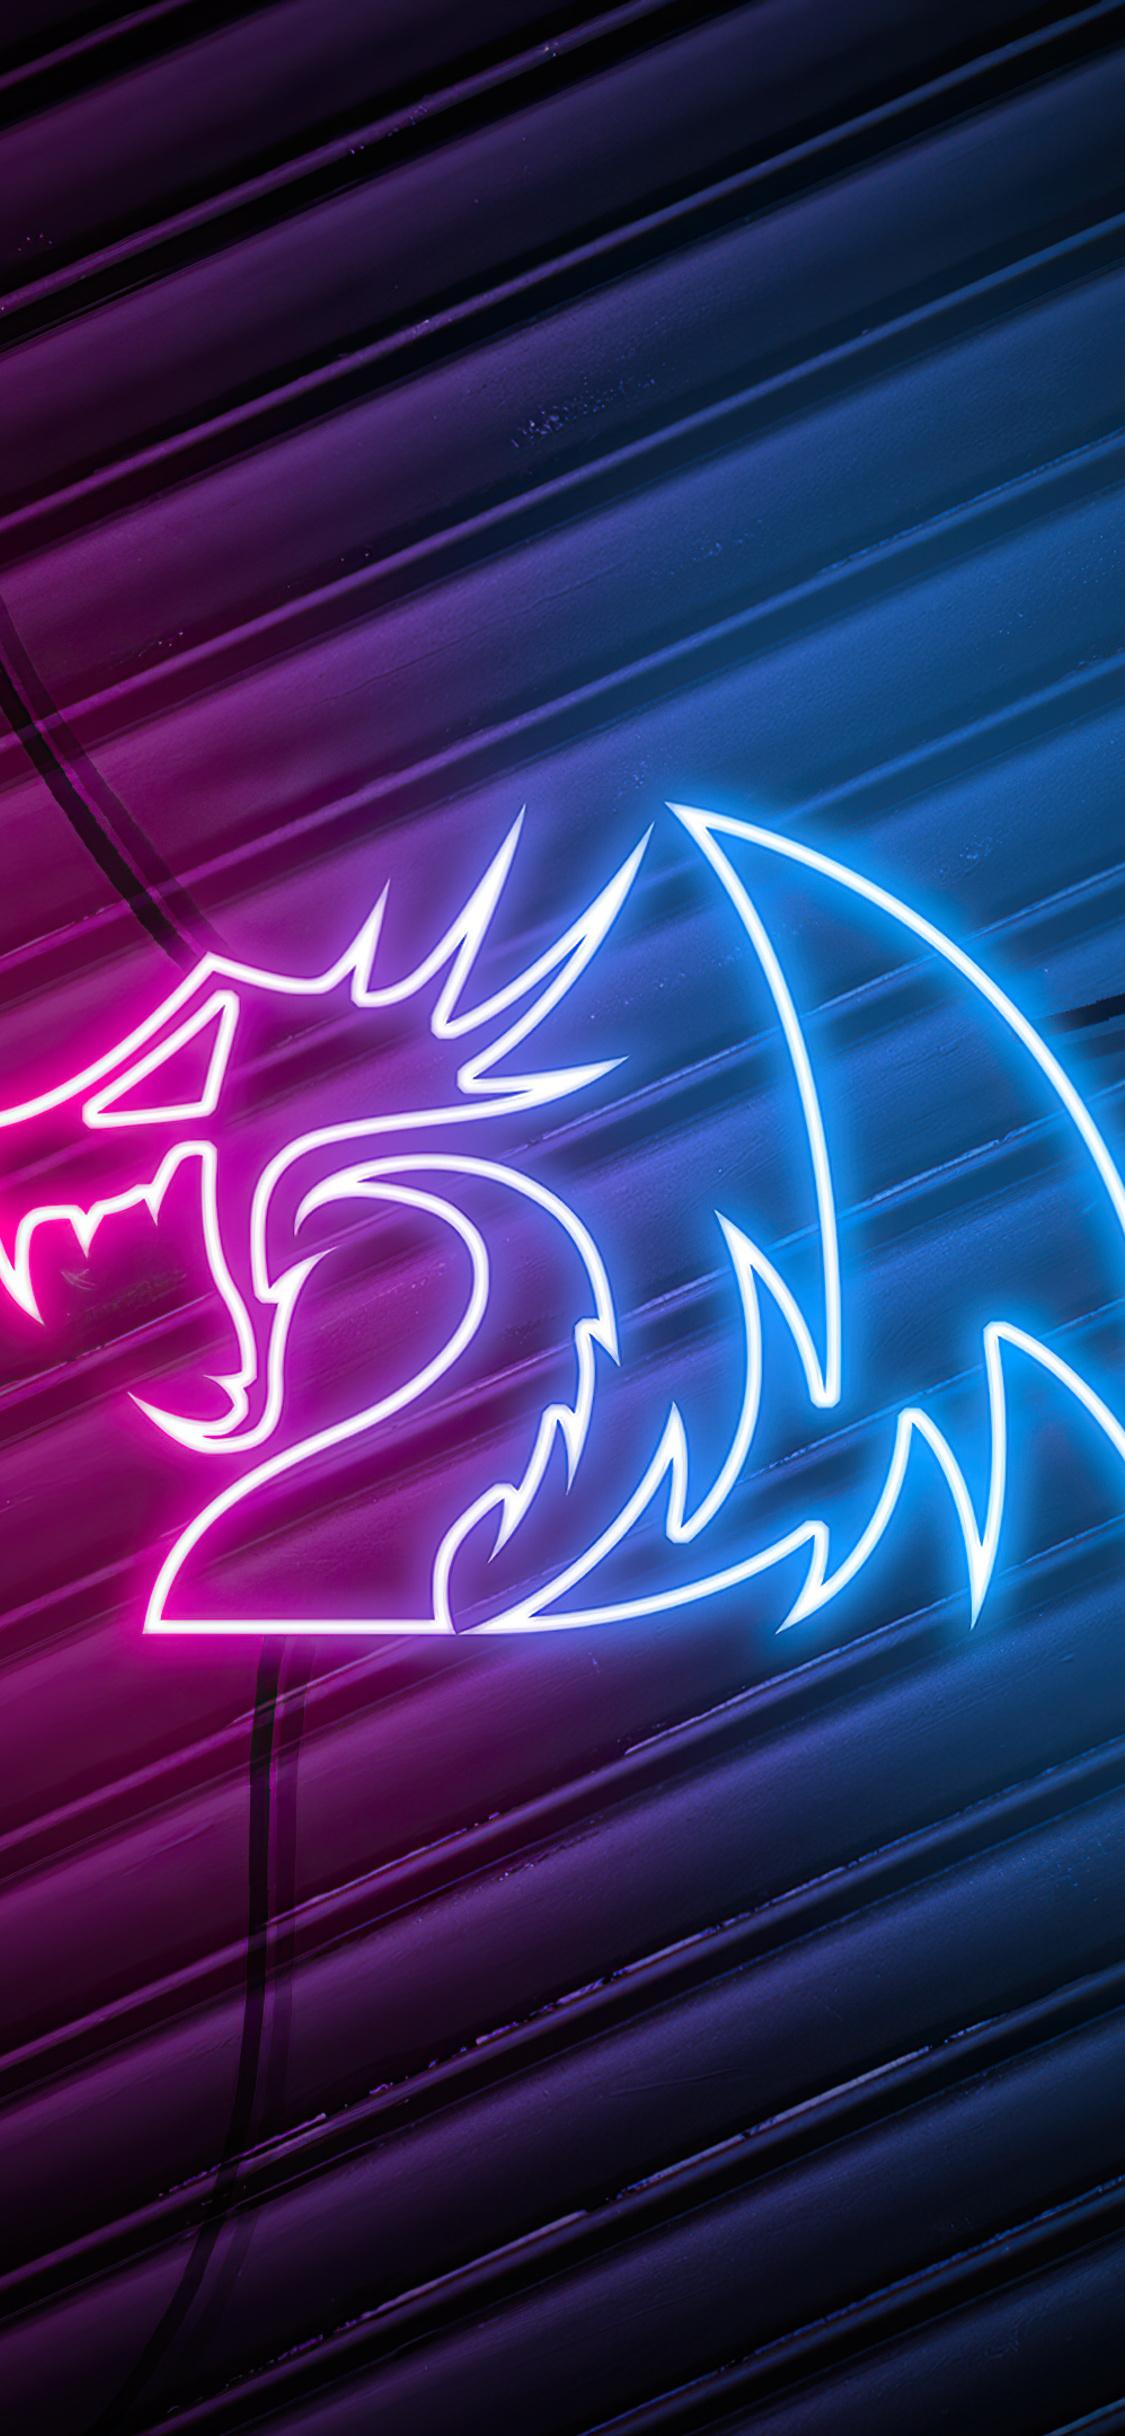 red-dragon-logo-4k-uq.jpg